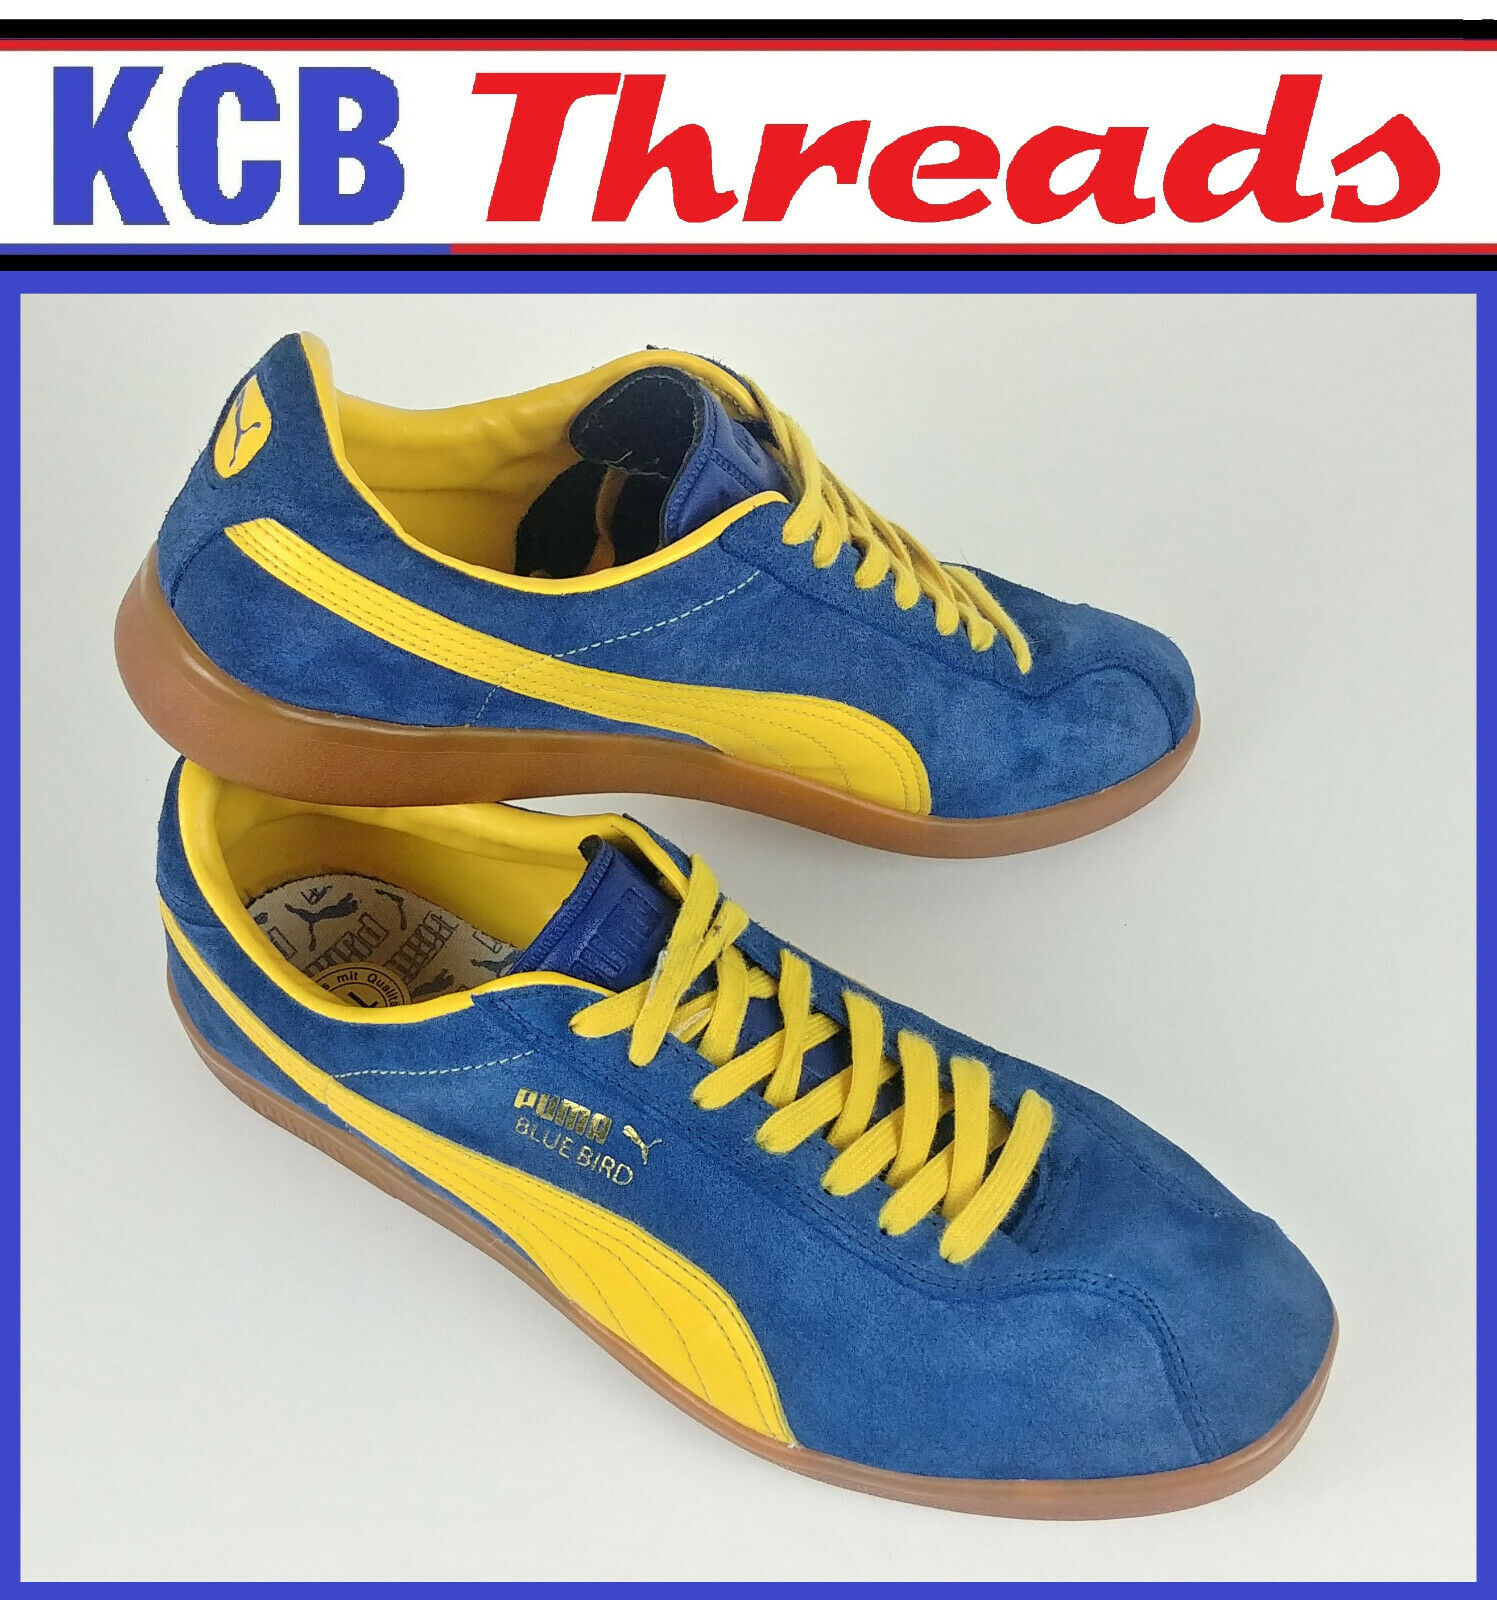 Puma blueebird Running Trainers 351962 bluee Yellow Suede Kicks shoes Mens Size 11